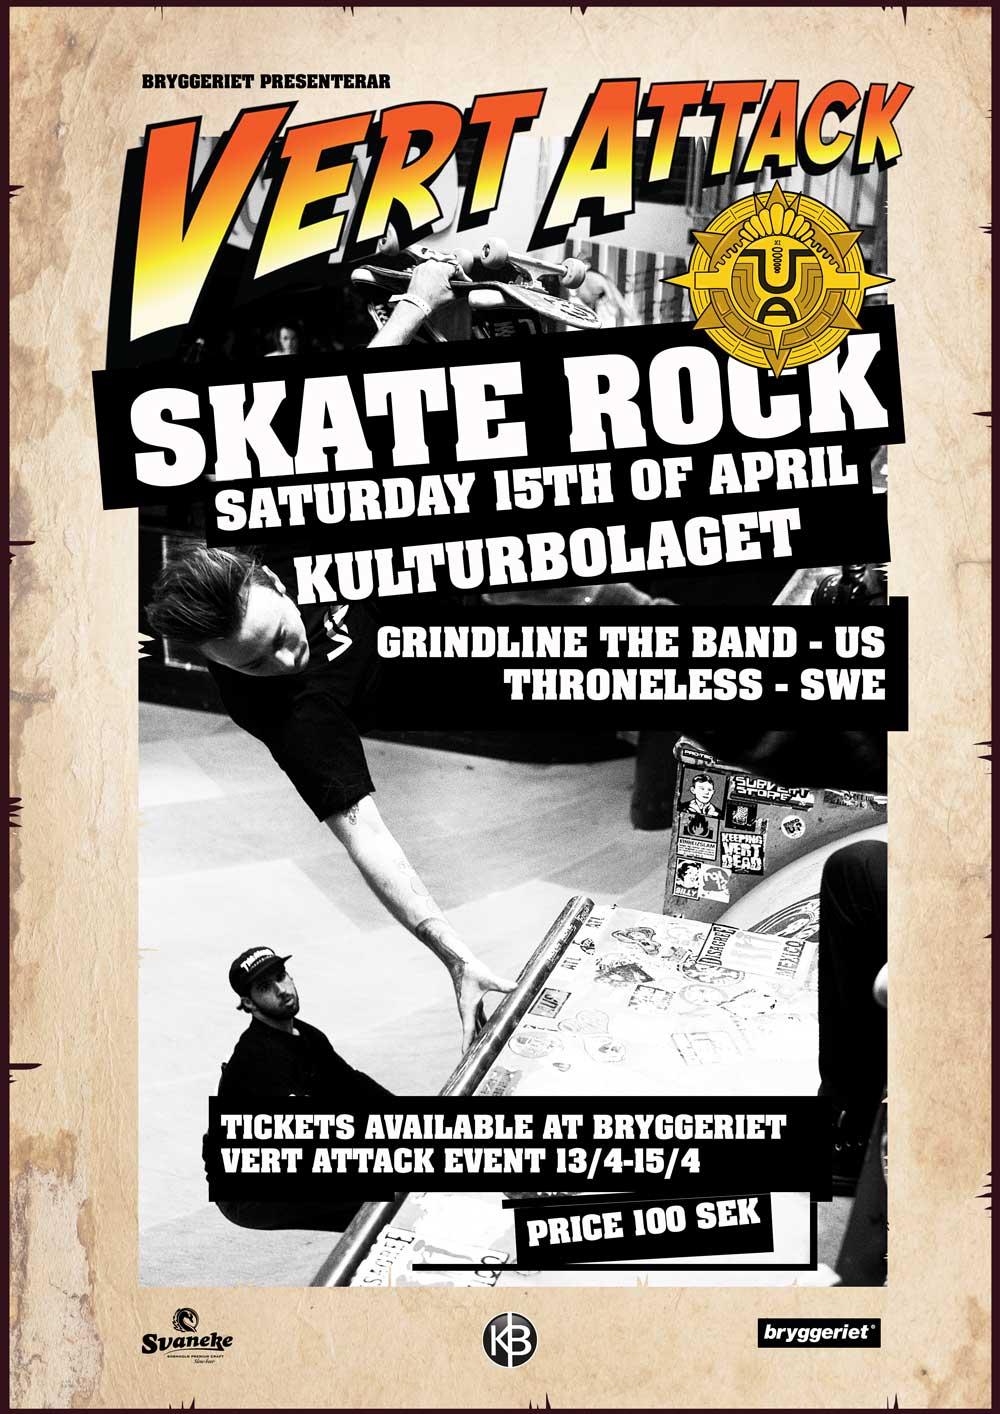 vert-attack-skate-rock